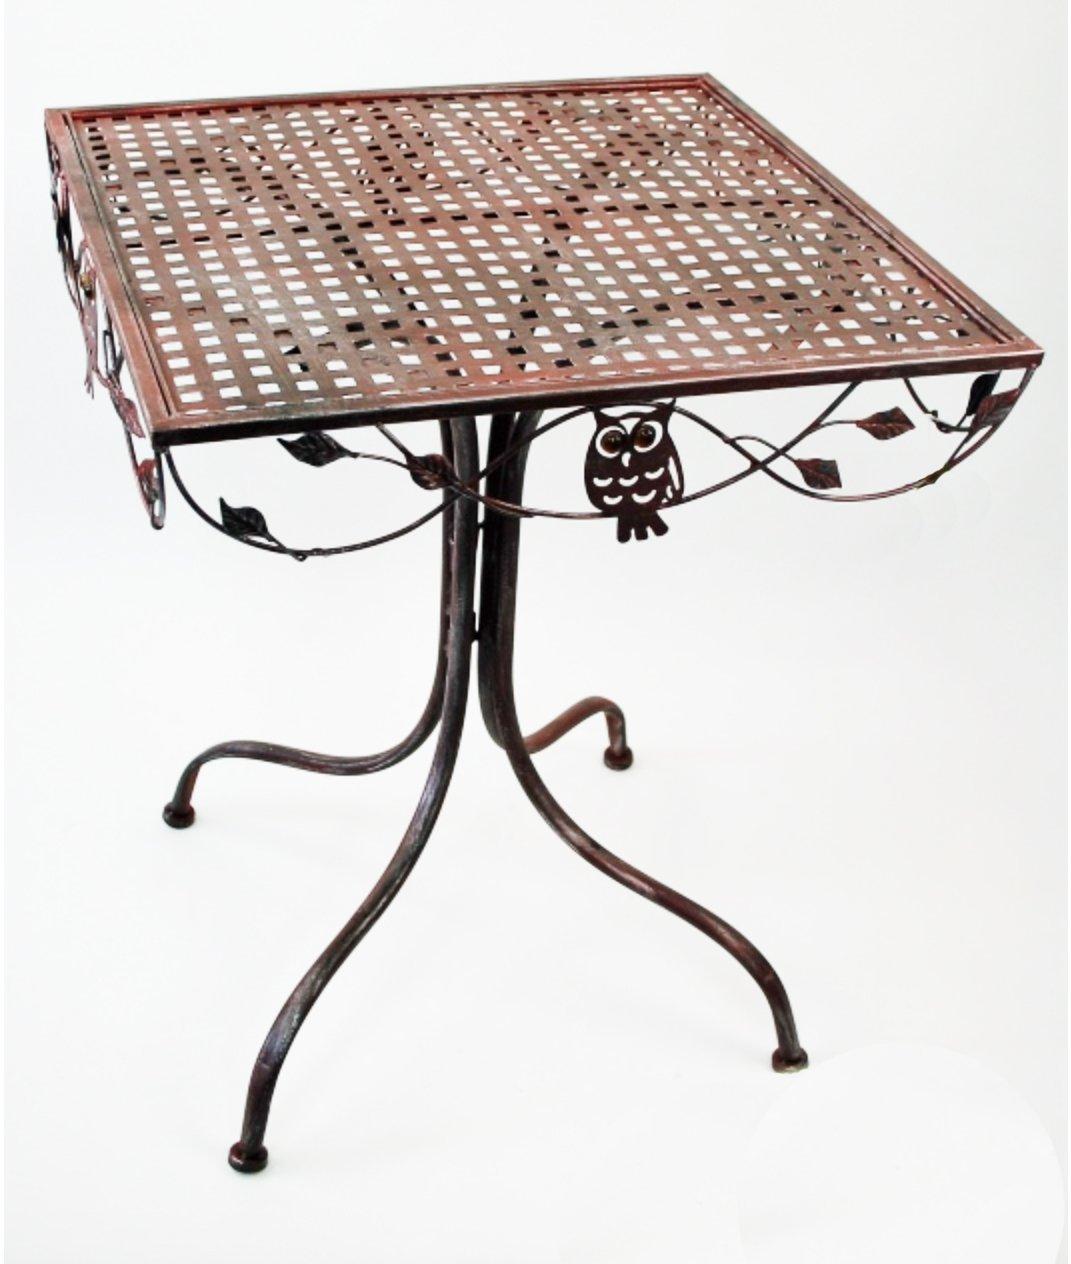 Gartentisch Gartensets Tischgruppe Metall Metalltisch Bistrostuhl